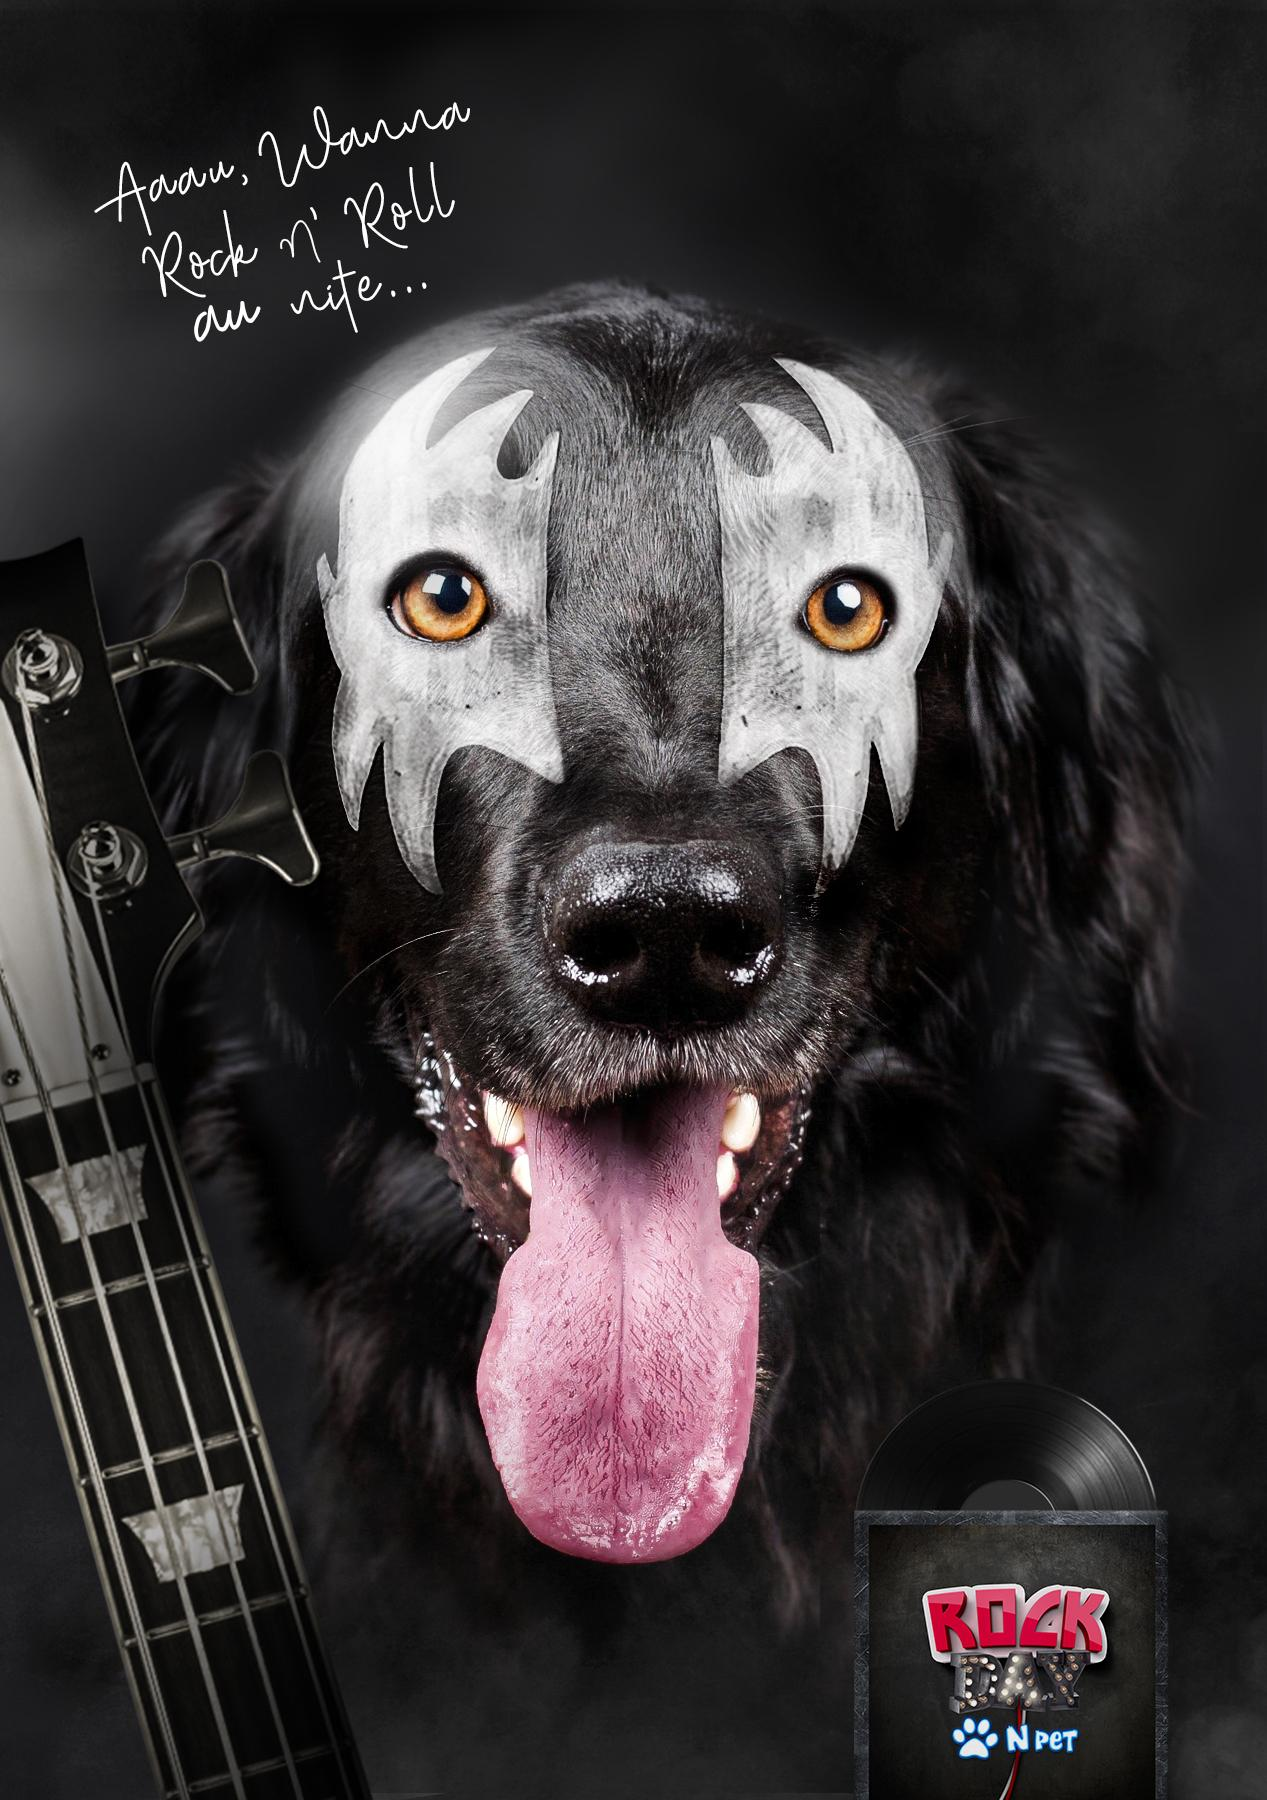 N Pet Print Ad - Rock Day N Pet, 1